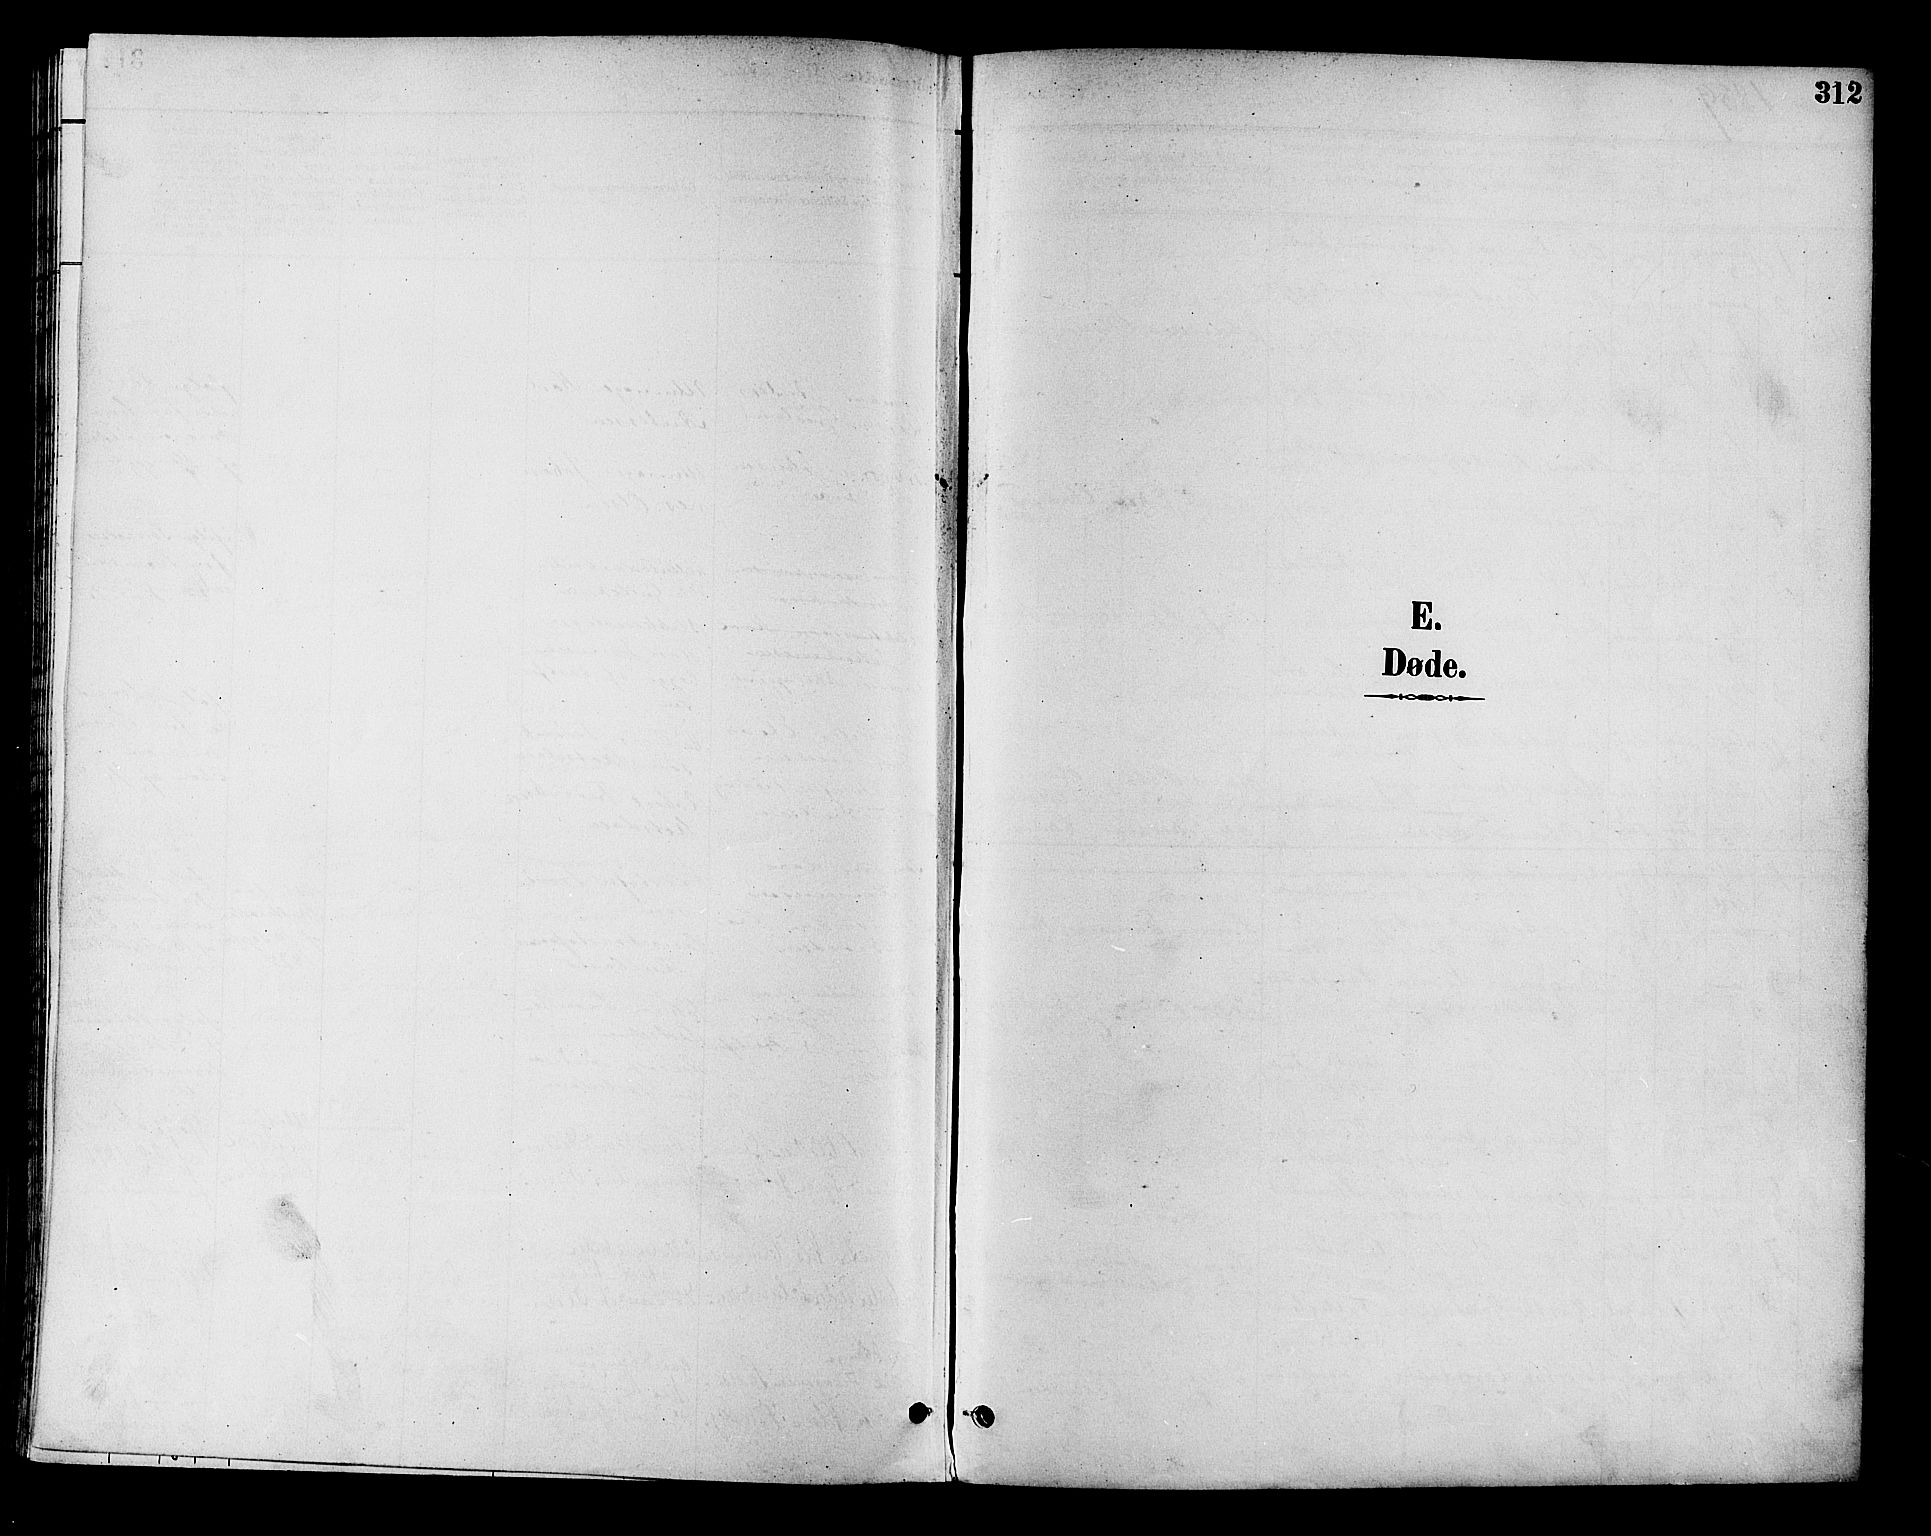 SAKO, Eiker kirkebøker, F/Fb/L0002: Ministerialbok nr. II 2, 1889-1896, s. 312